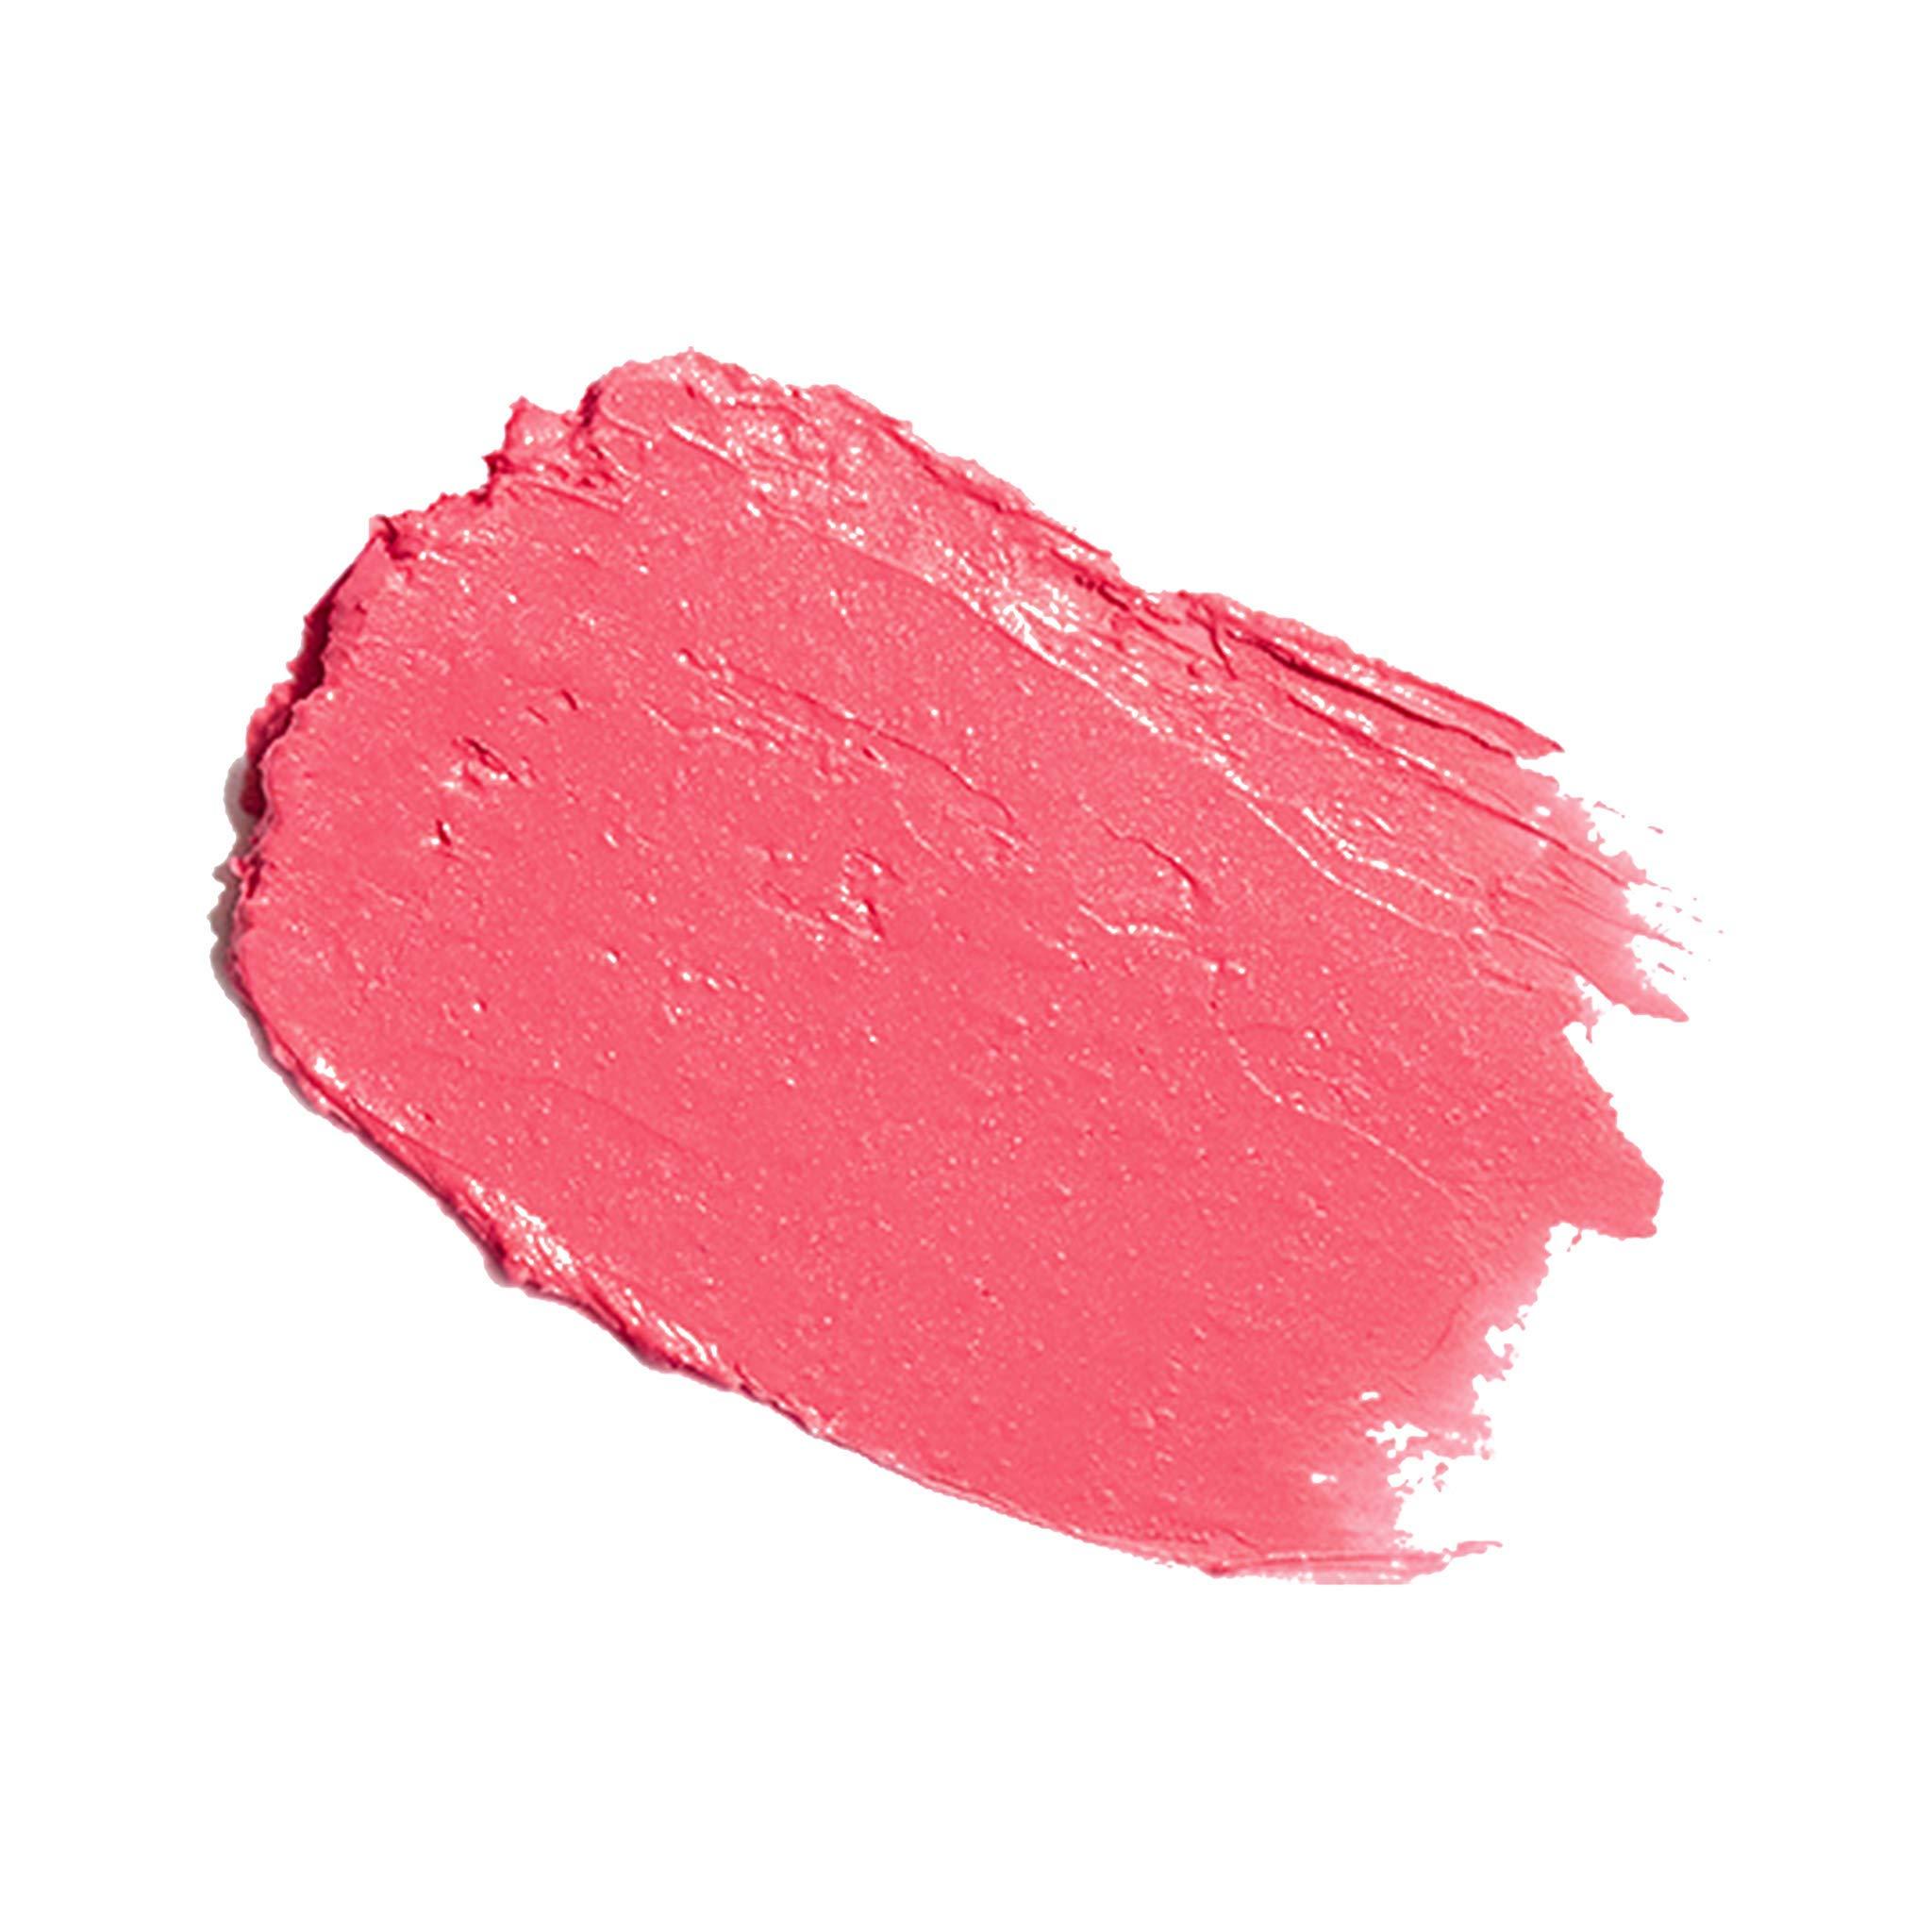 100% Pure Pink Grapefruit Glow Lip & Cheek Tint, .26 oz by 100% PURE (Image #2)